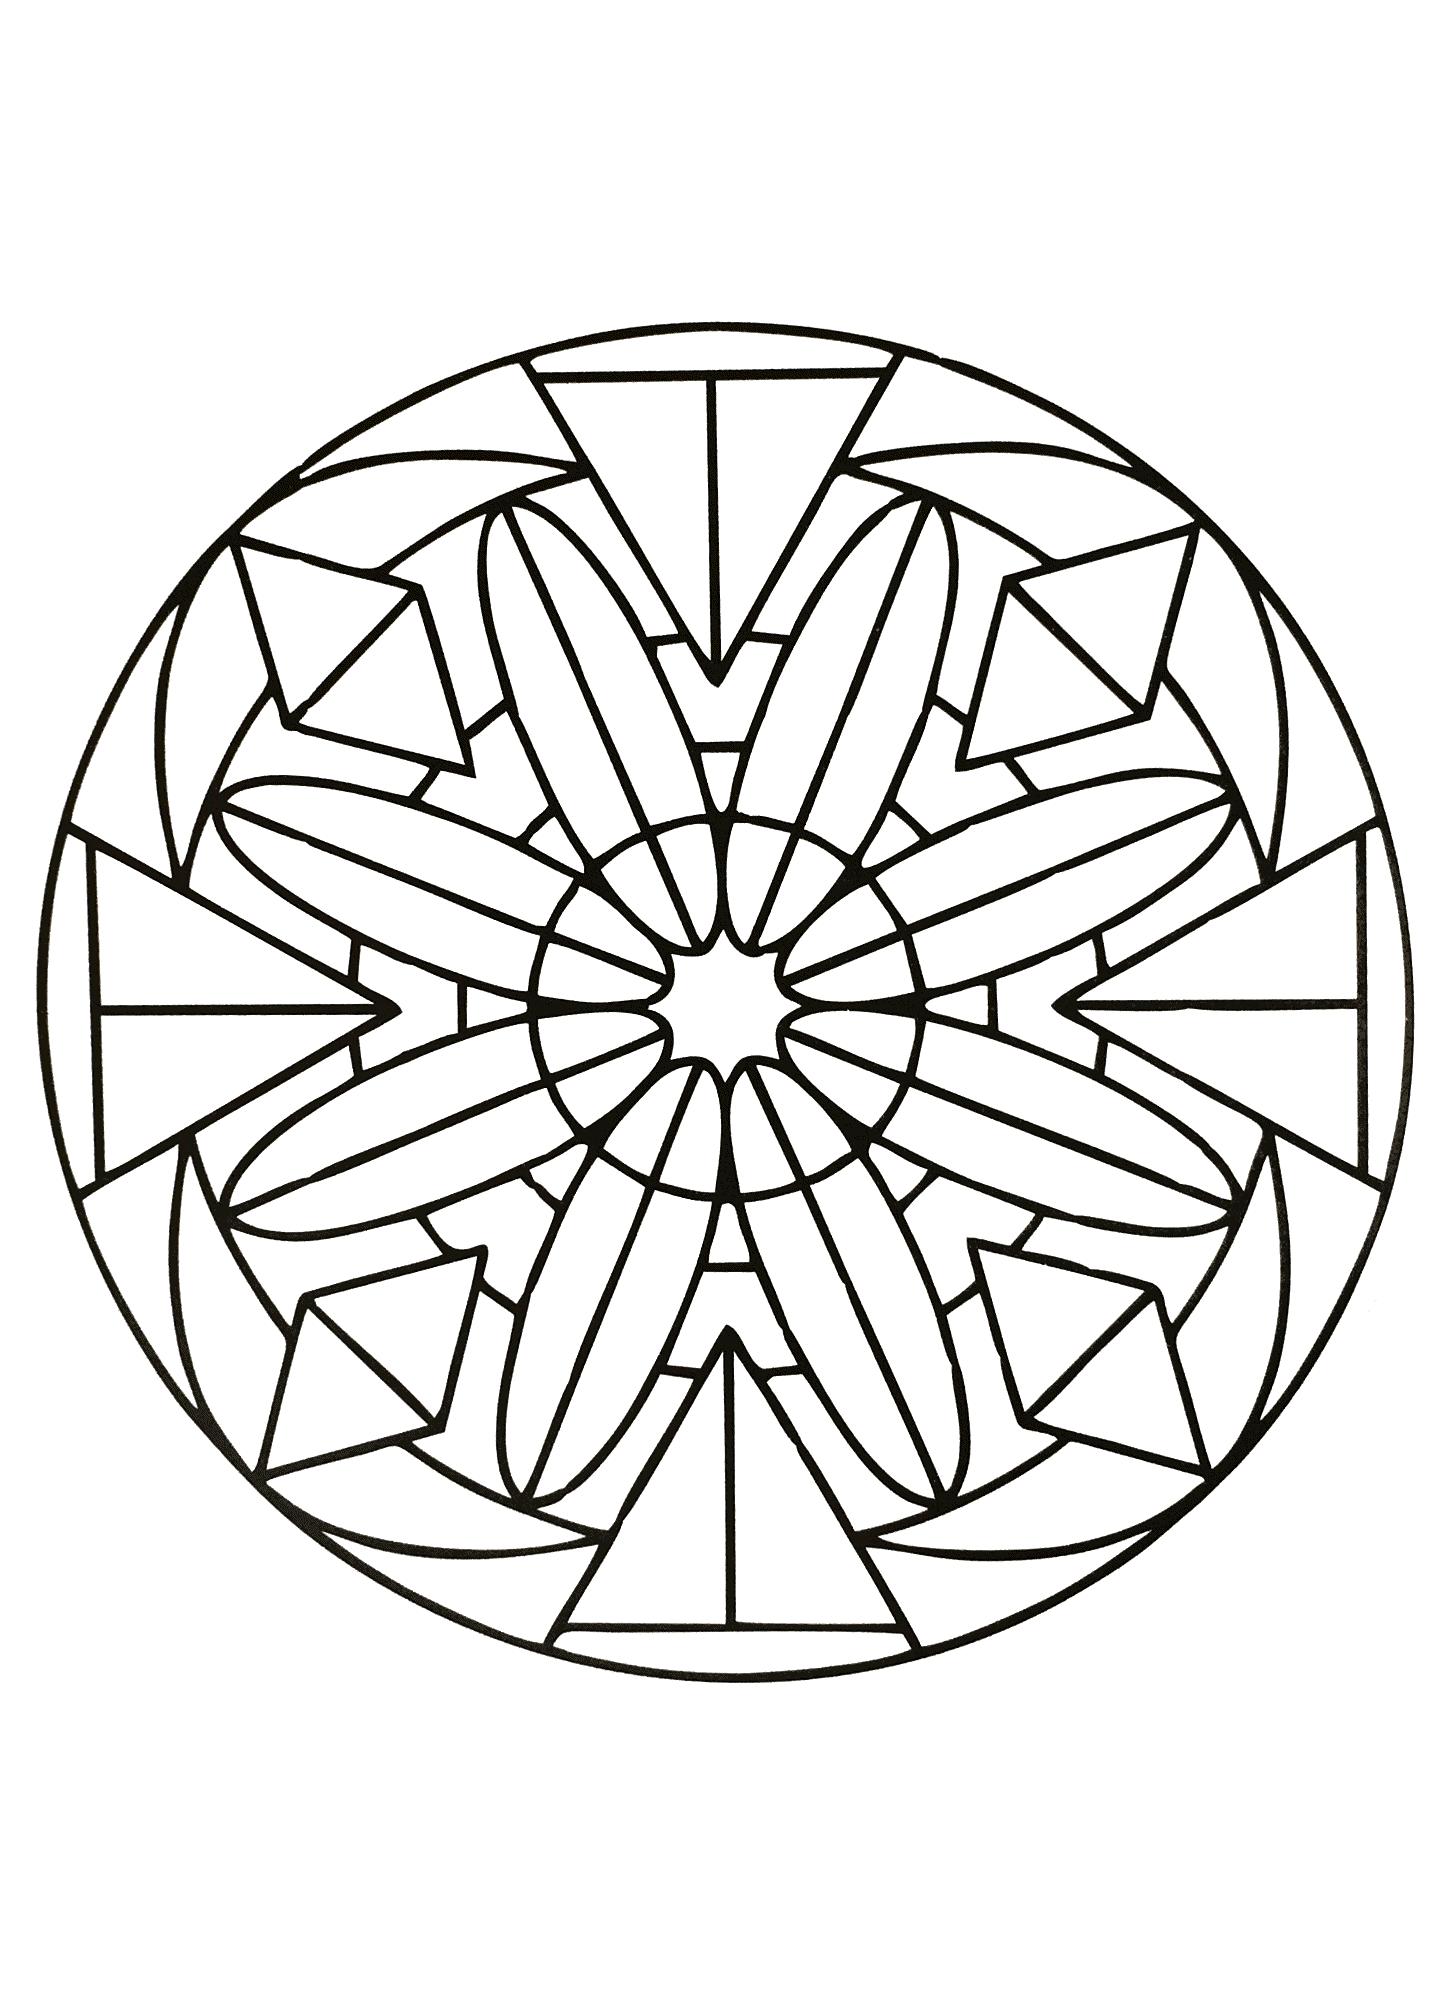 Mandalas geometric to print 17 mandalas with geometric for Simple geometric designs coloring pages